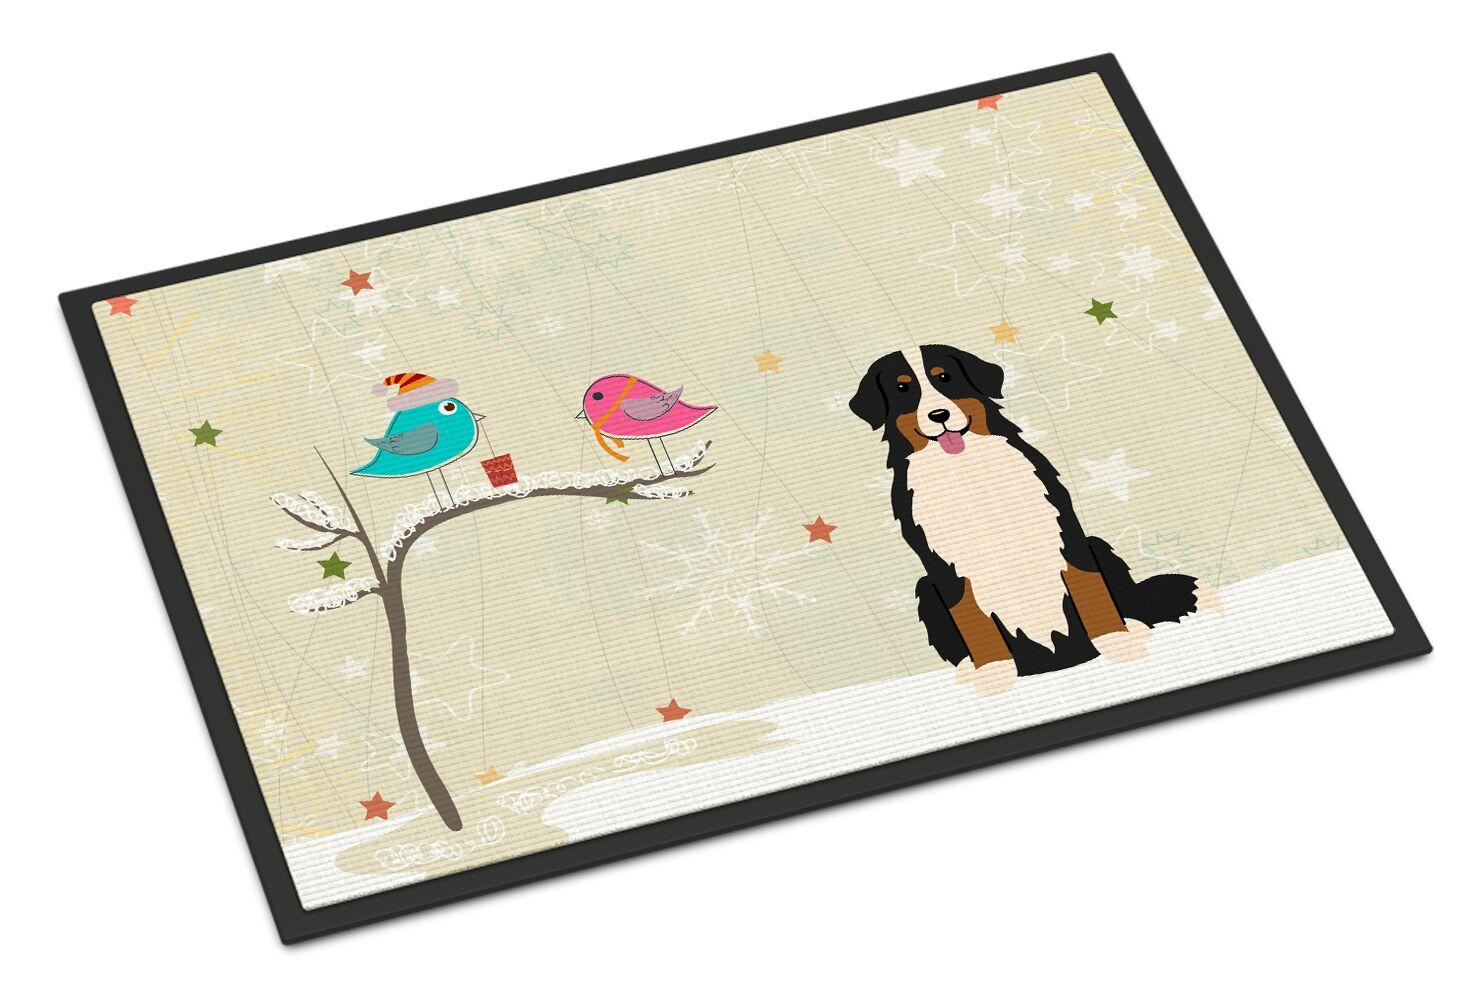 Christmas Presents Between Friends Bernese Mountain Dog Doormat Mat Size: Rectangle 1'6